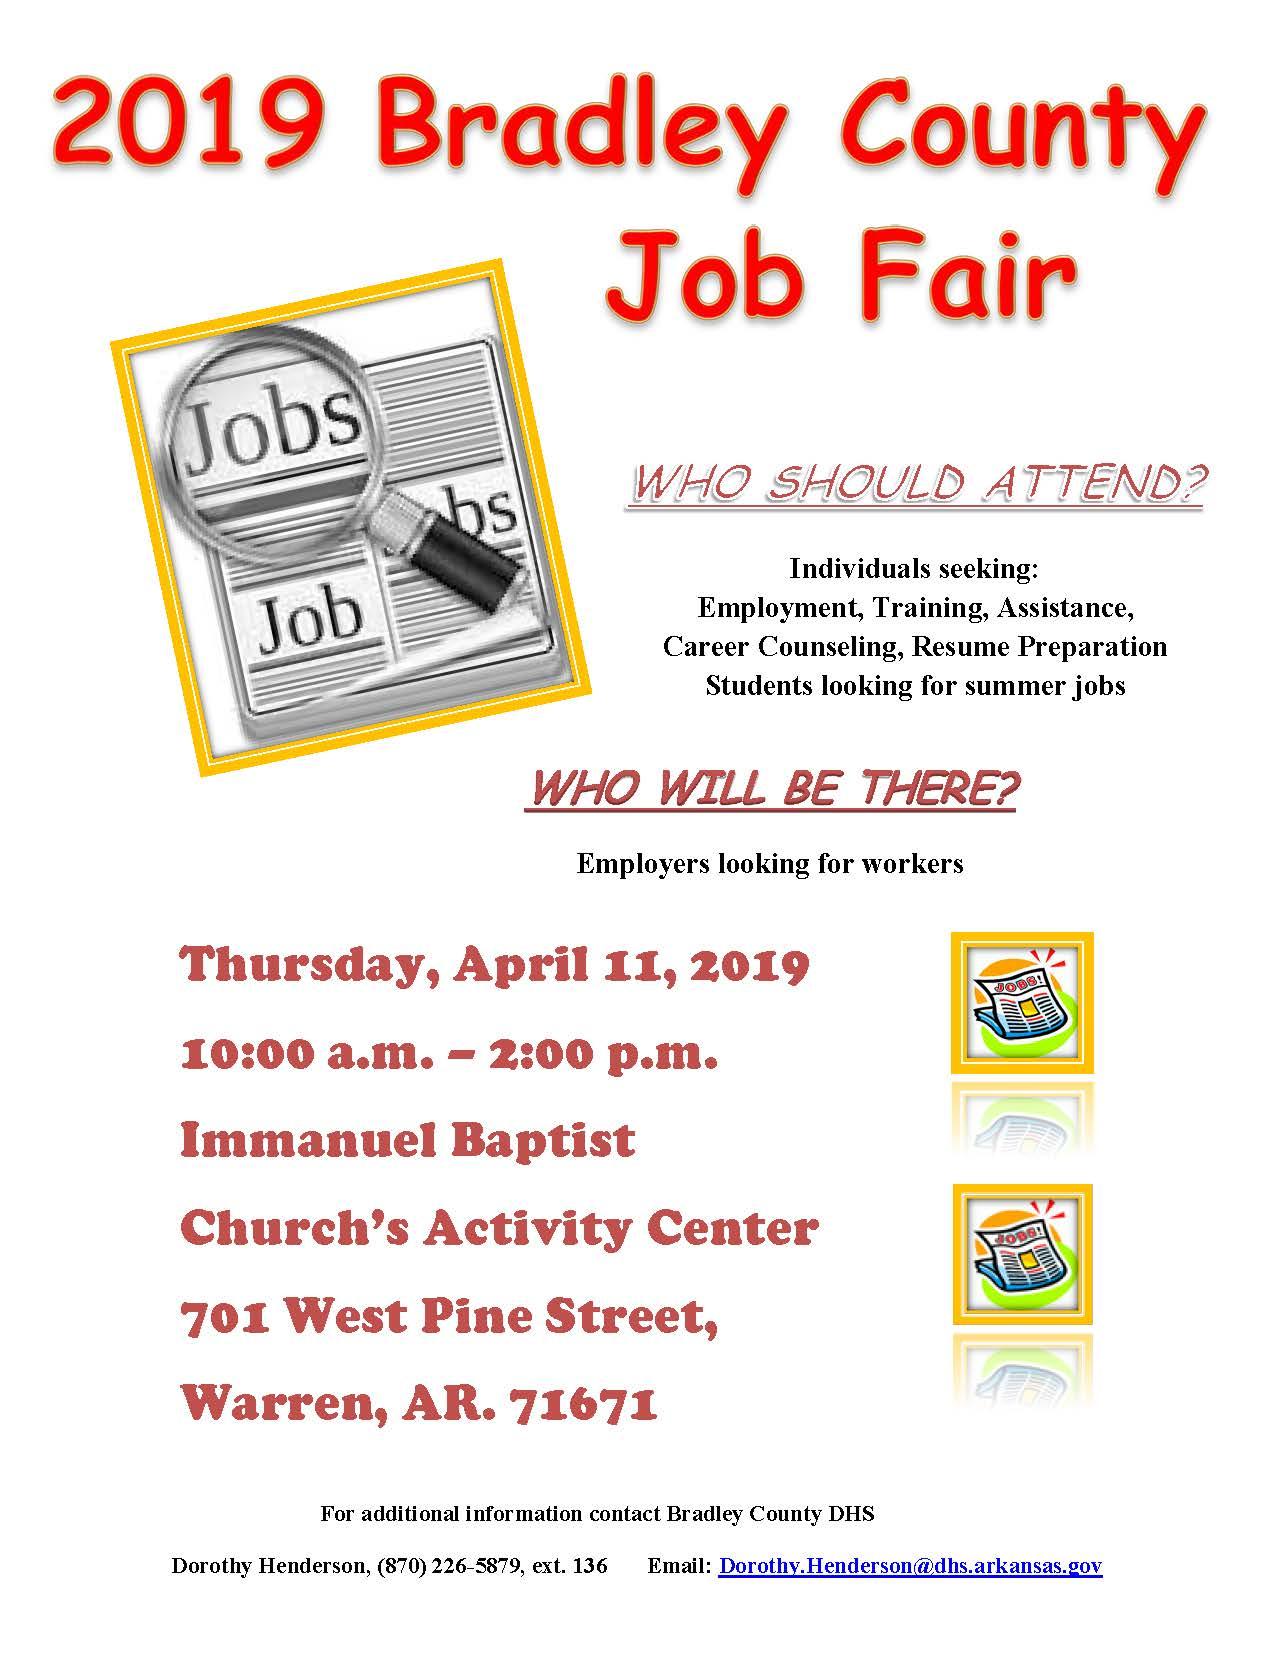 Job Fair Flyer 2019